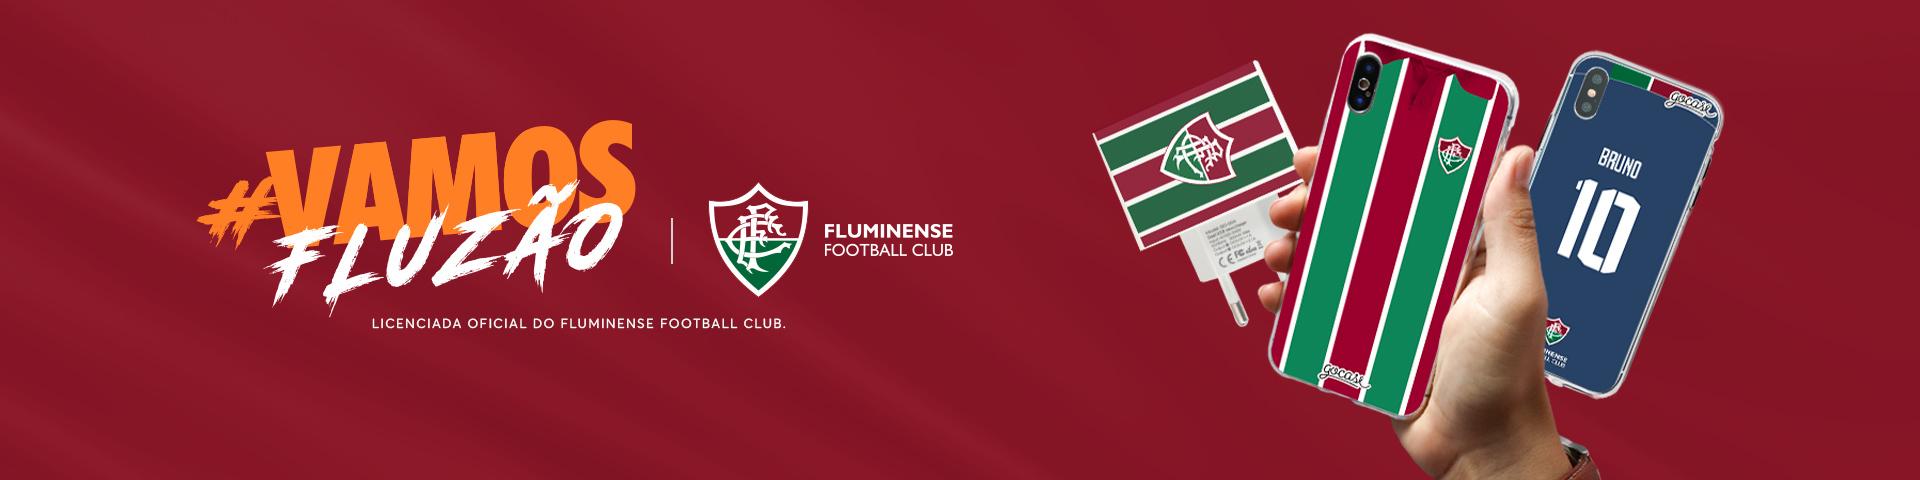 Fluminense desktop